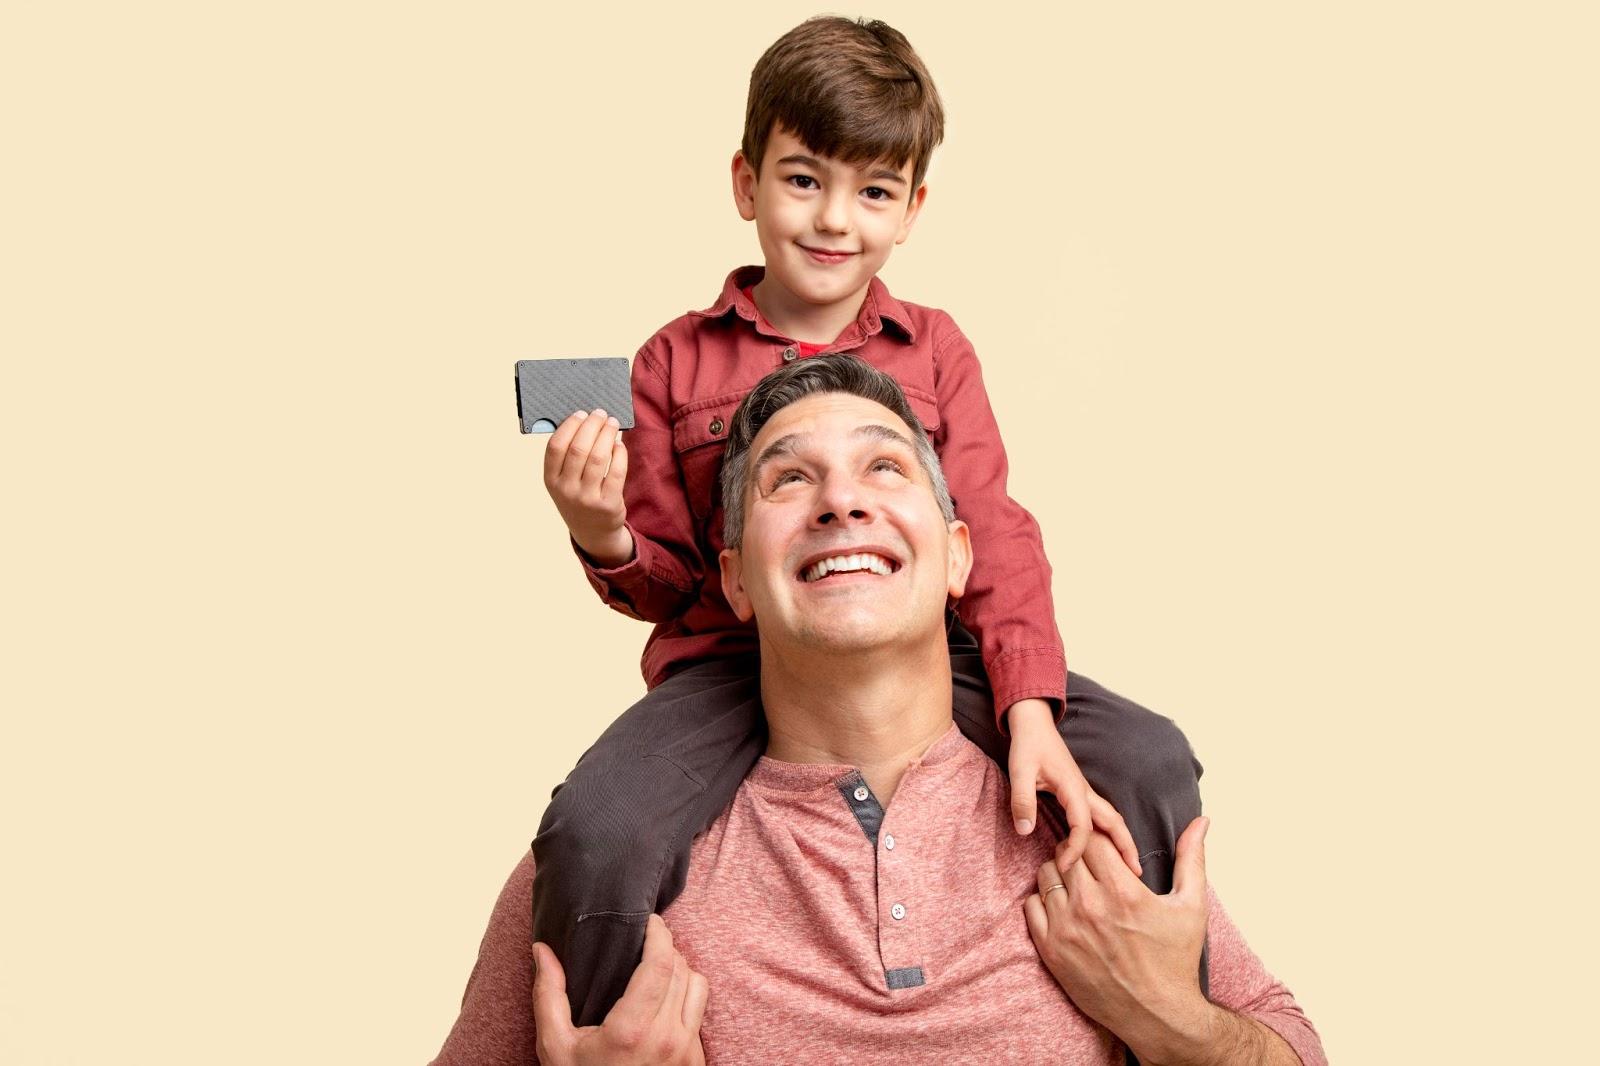 https://ridge.com/pages/fathers-day?utm_source=native&utm_medium=media%20mobilize&utm_campaign=6AM%2006_03&nbt=nb%3Anativeemail%3A%3A6AM%2006_03%3AJune%202021%3A